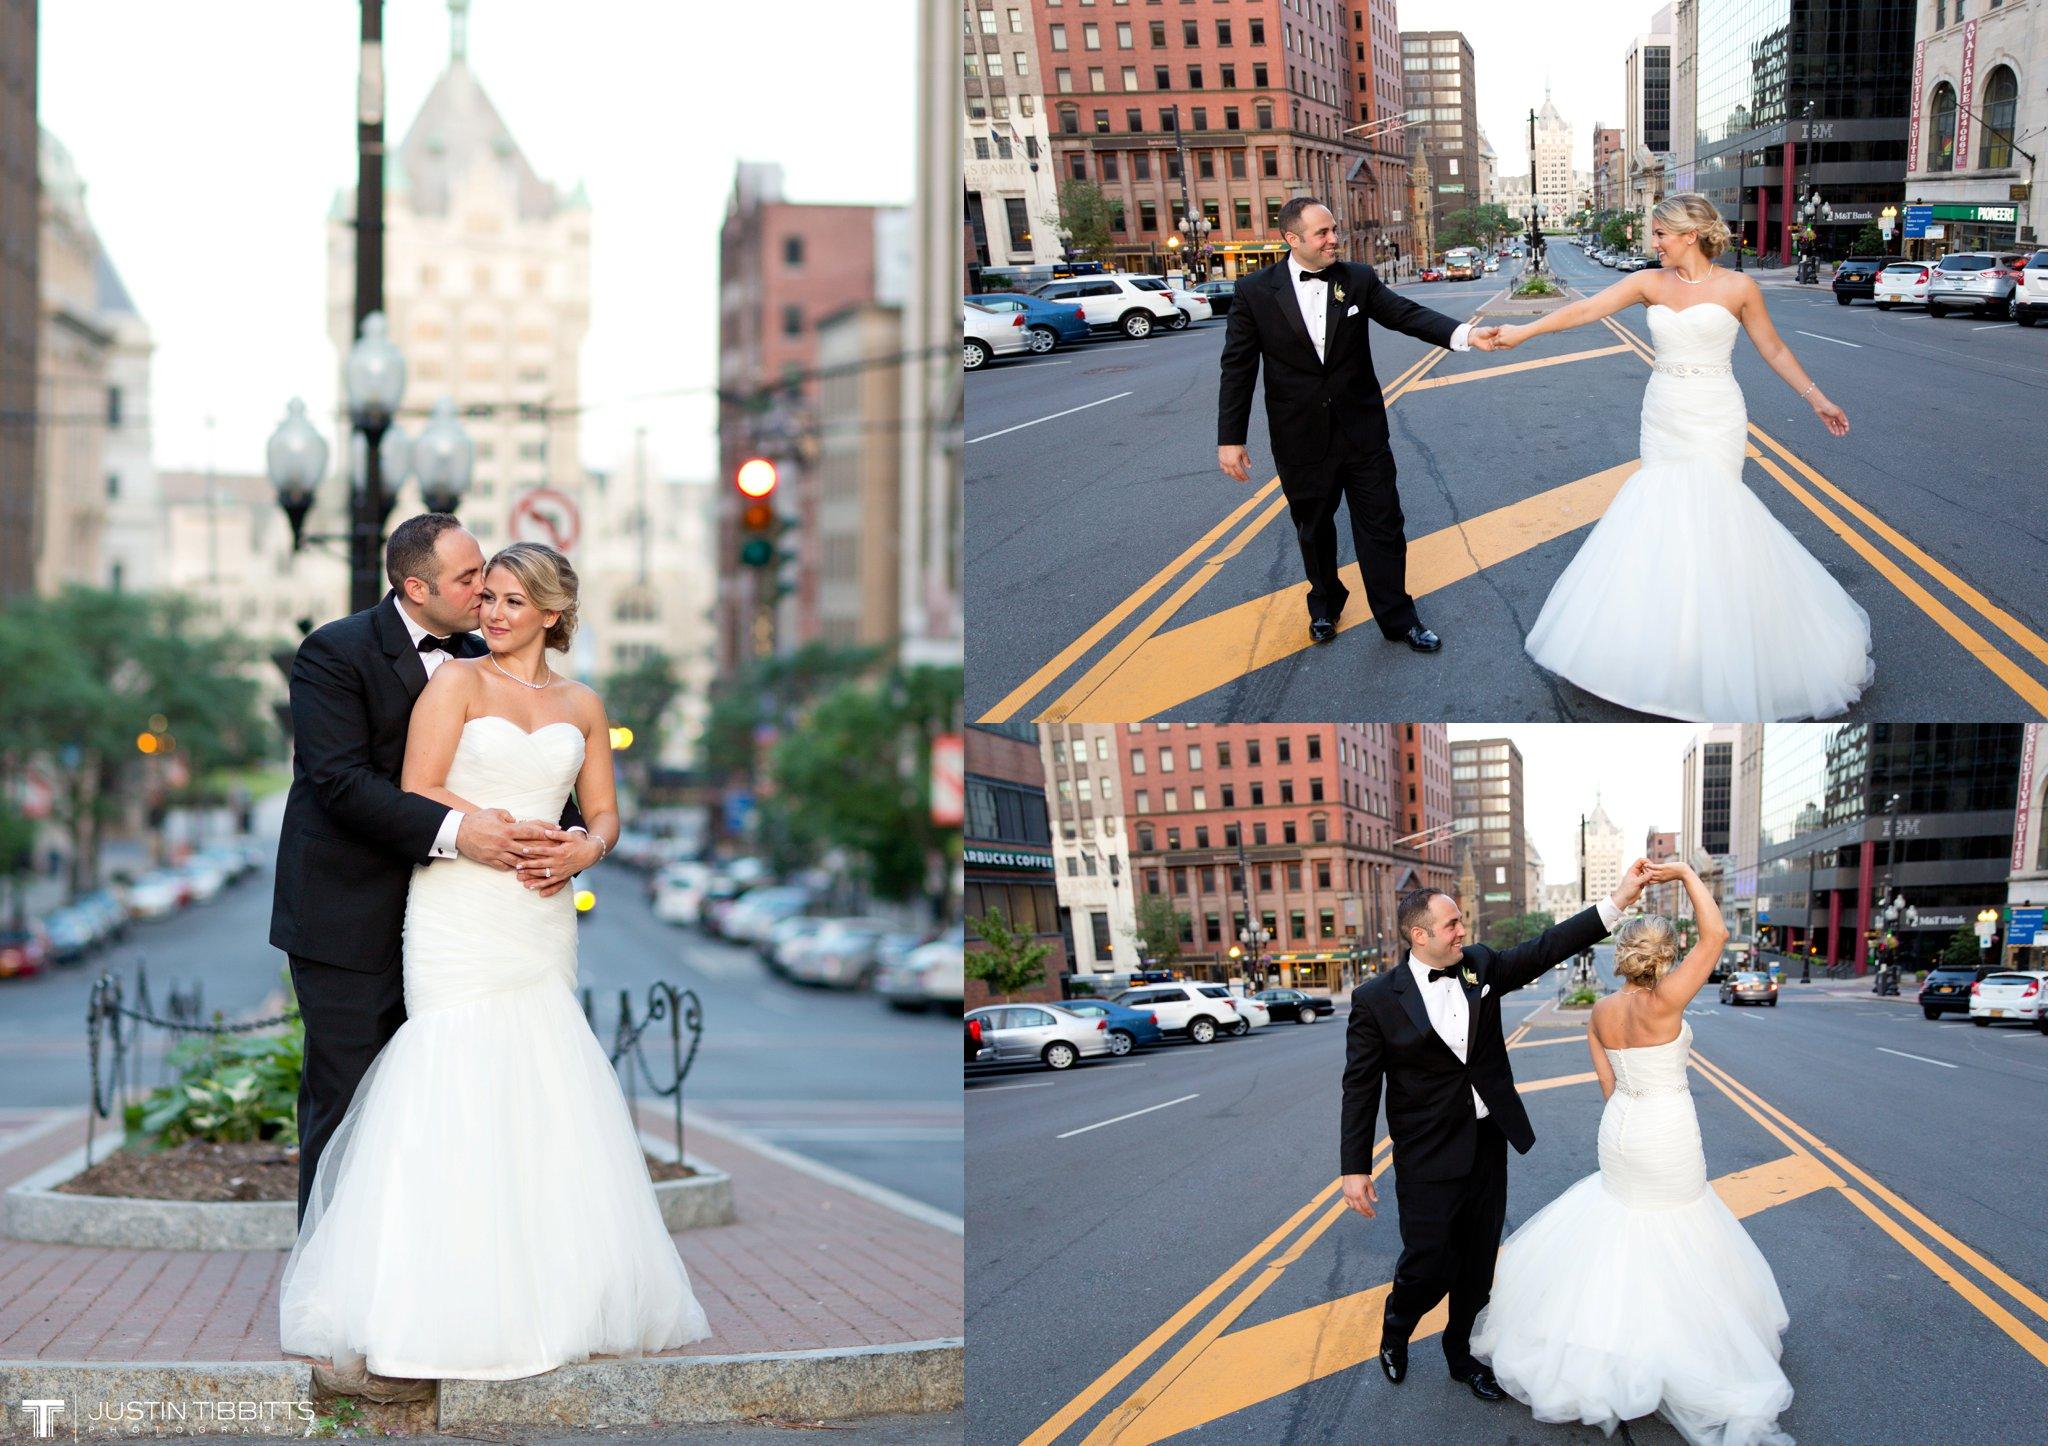 state-room-wedding-photos-with-amanda-and-nick_0172